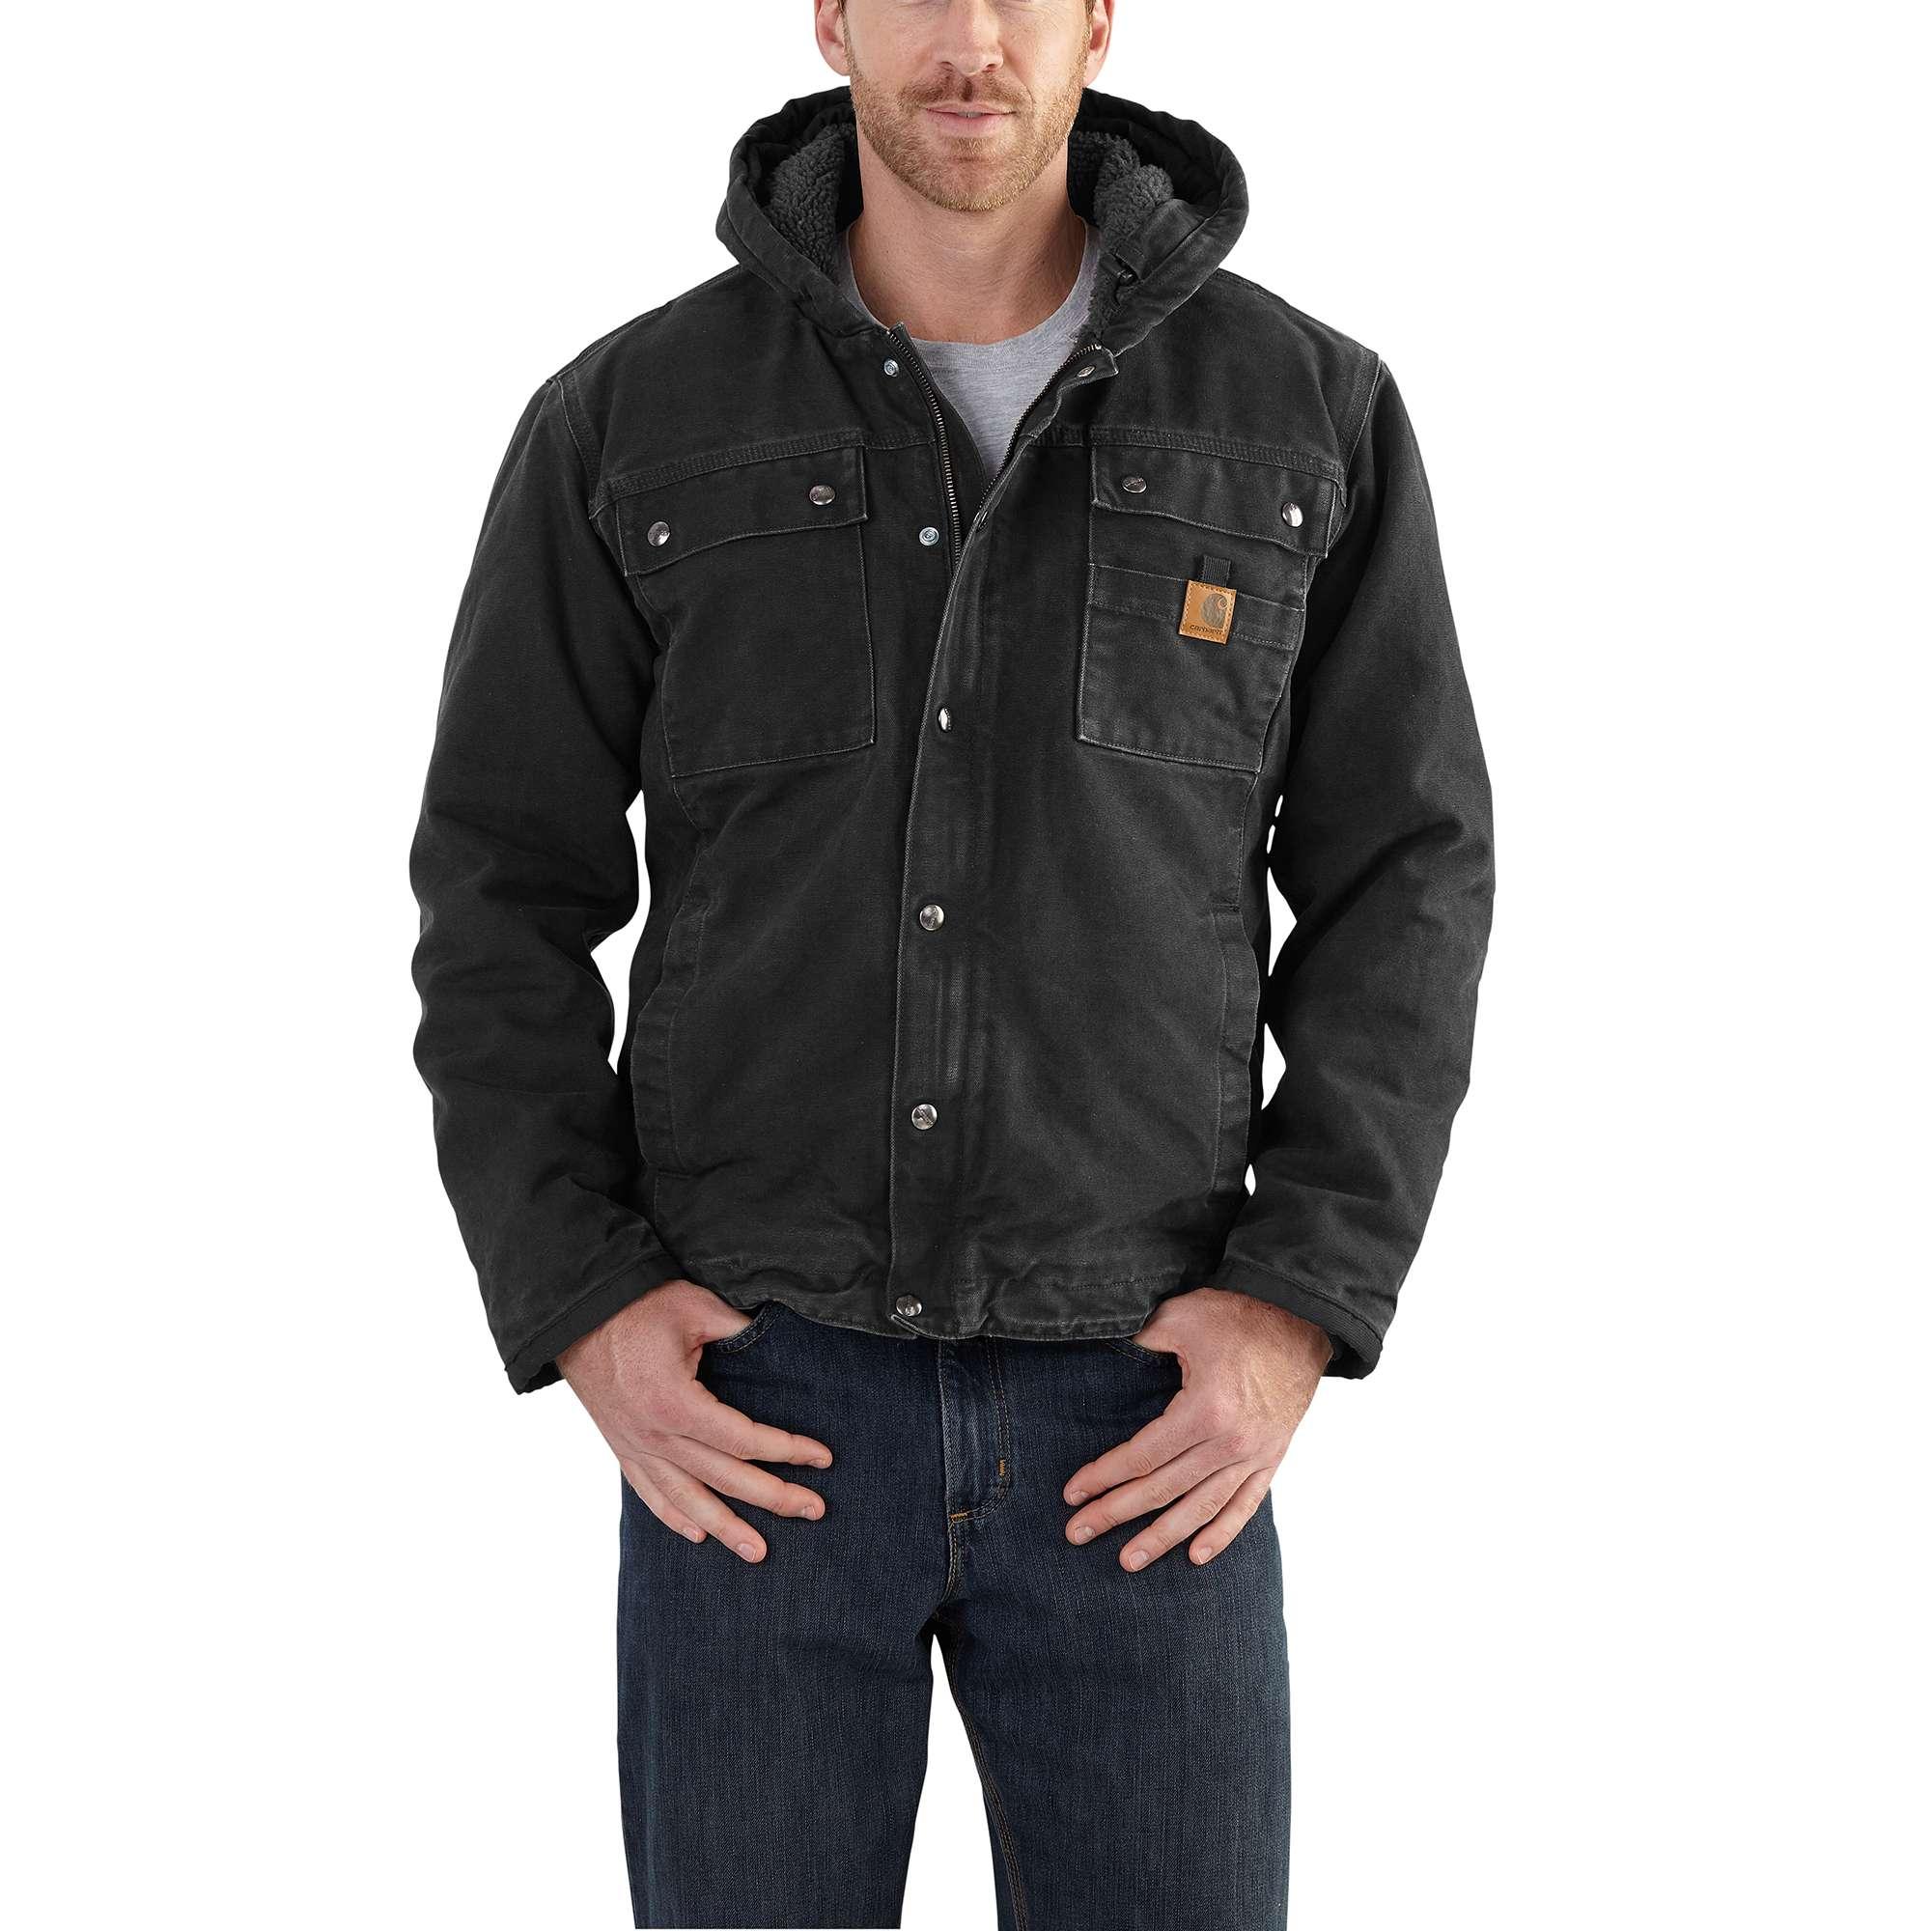 Carhartt Bartlett Sherpa-Lined Jacket